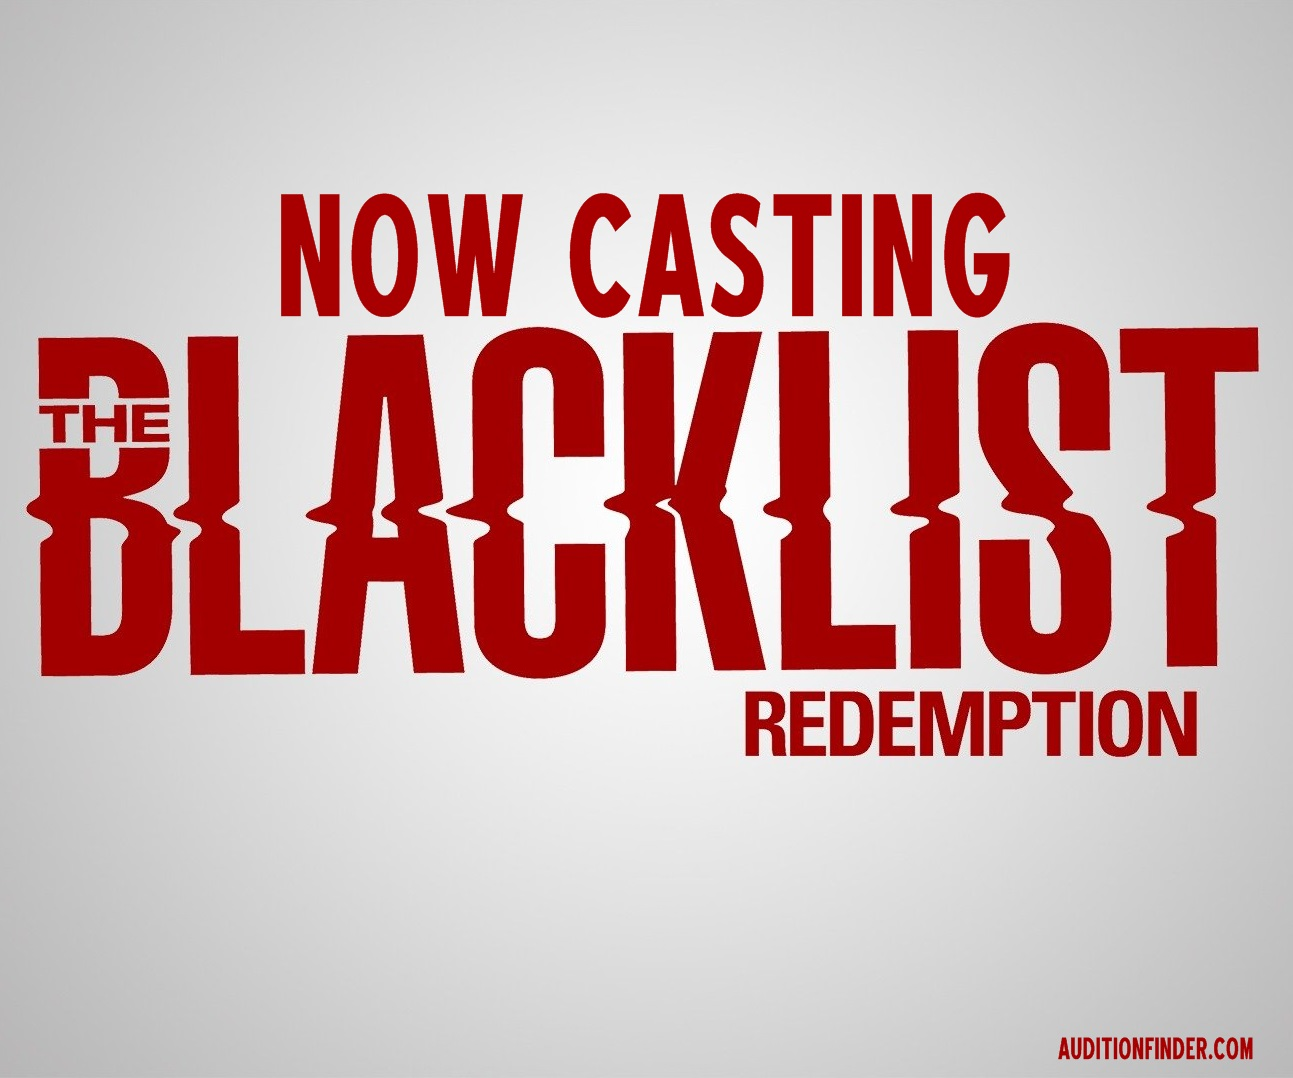 image of The Nbc Blacklist 2